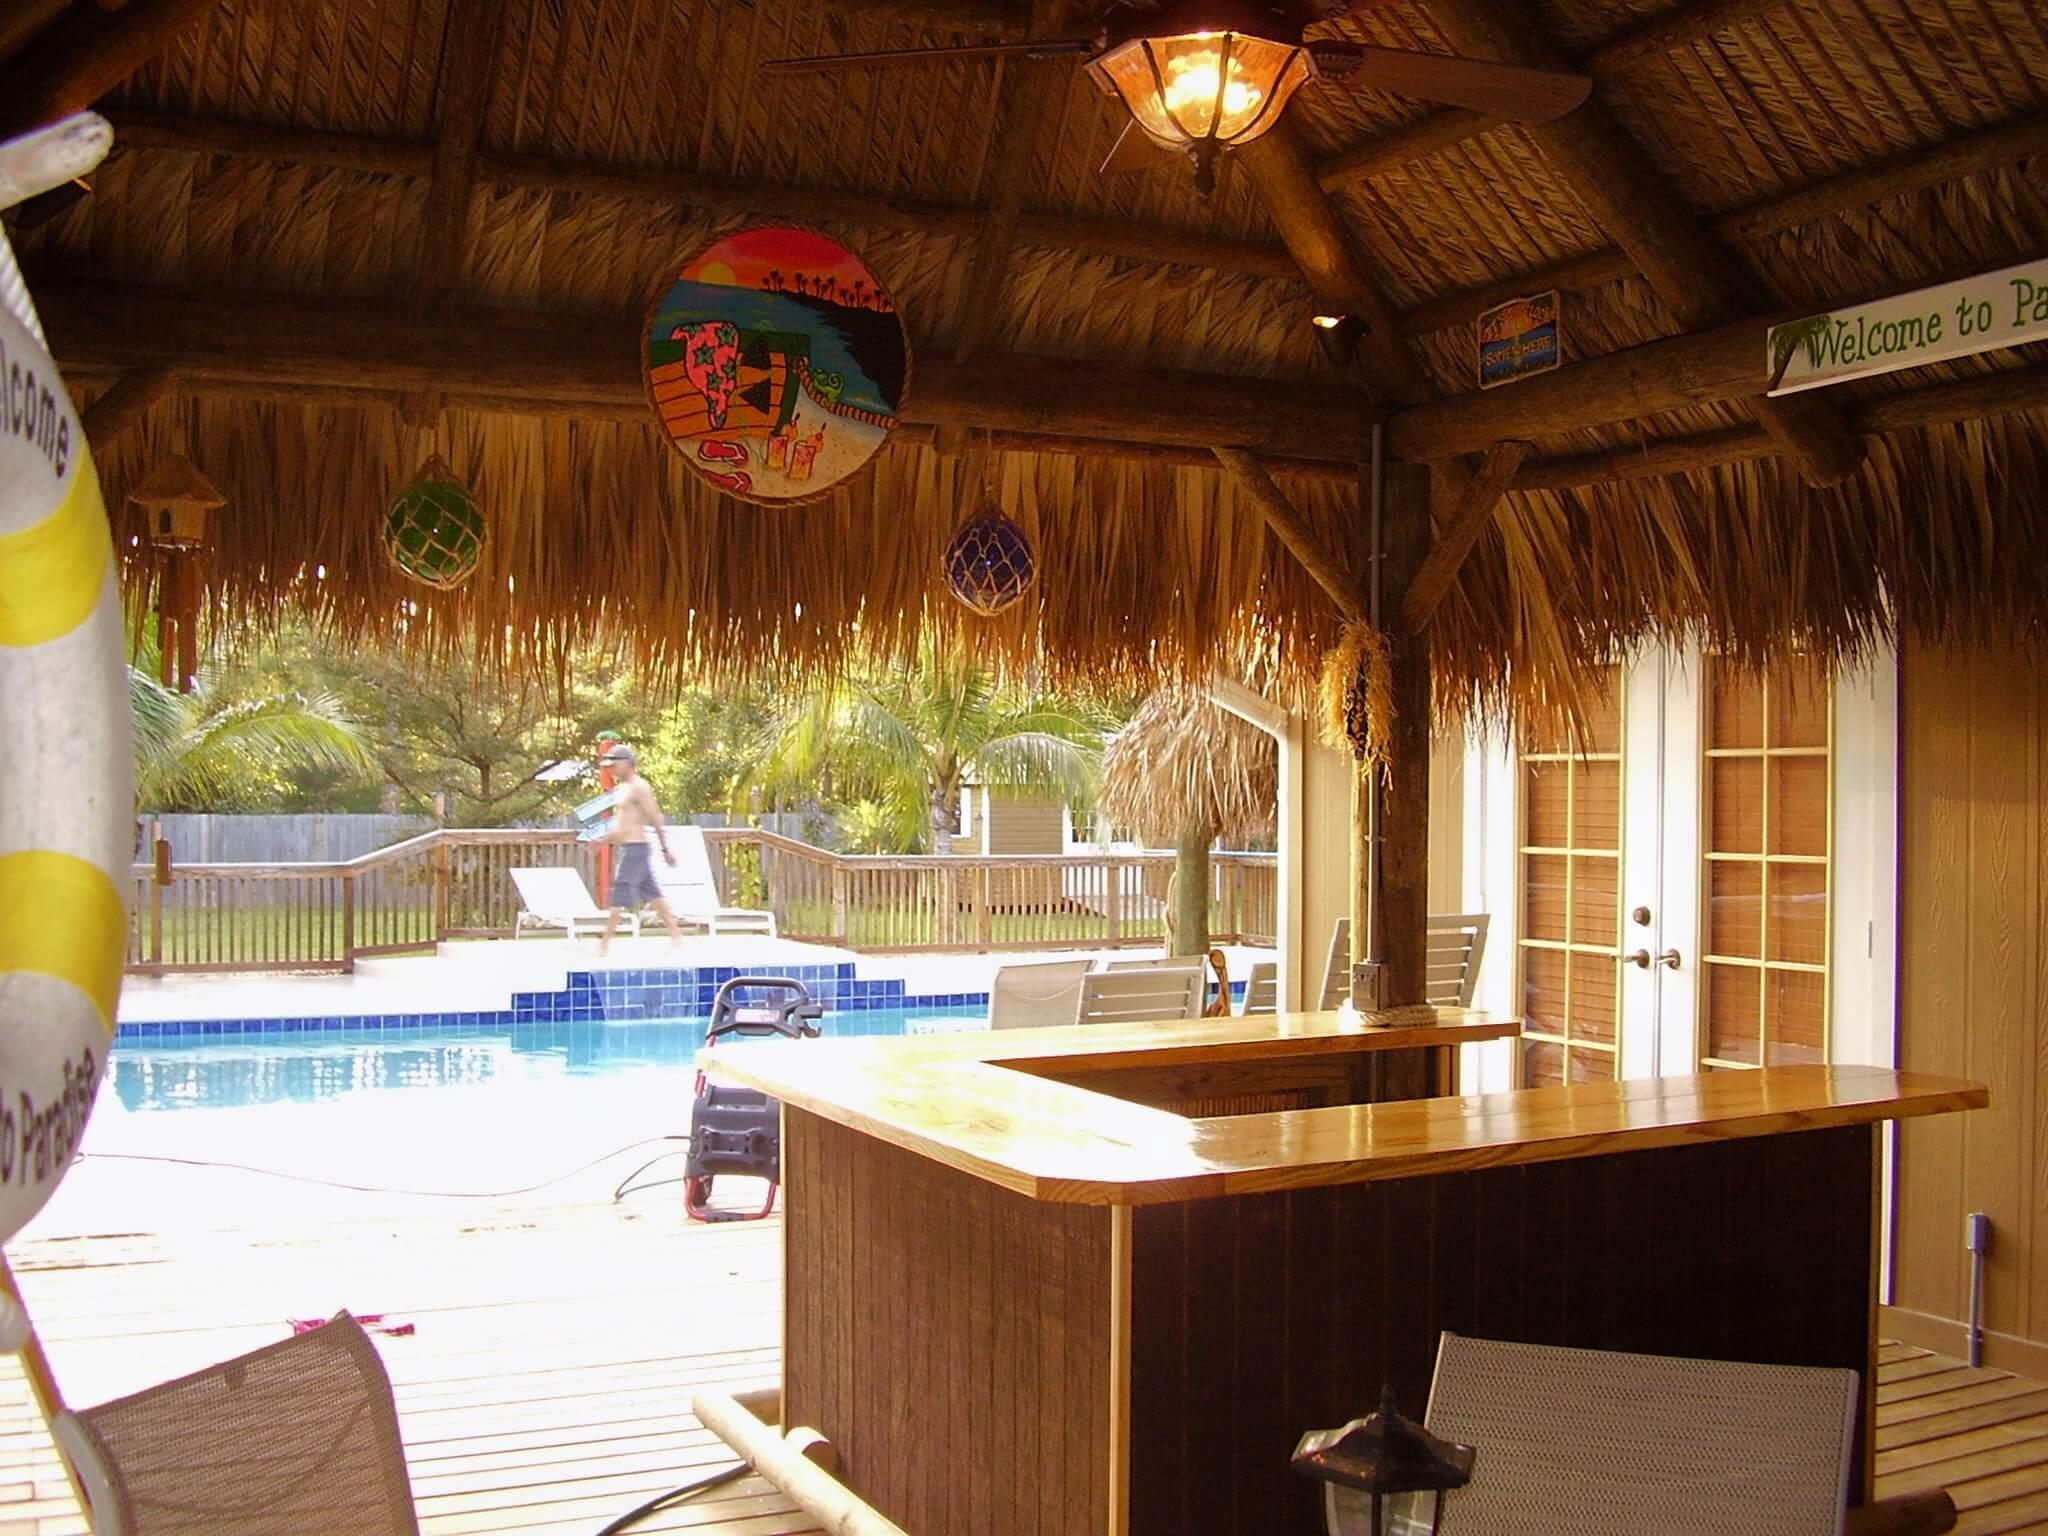 Home Design Ideas: Small Backyard Tiki Bar on Backyard Tiki Hut Designs id=20568